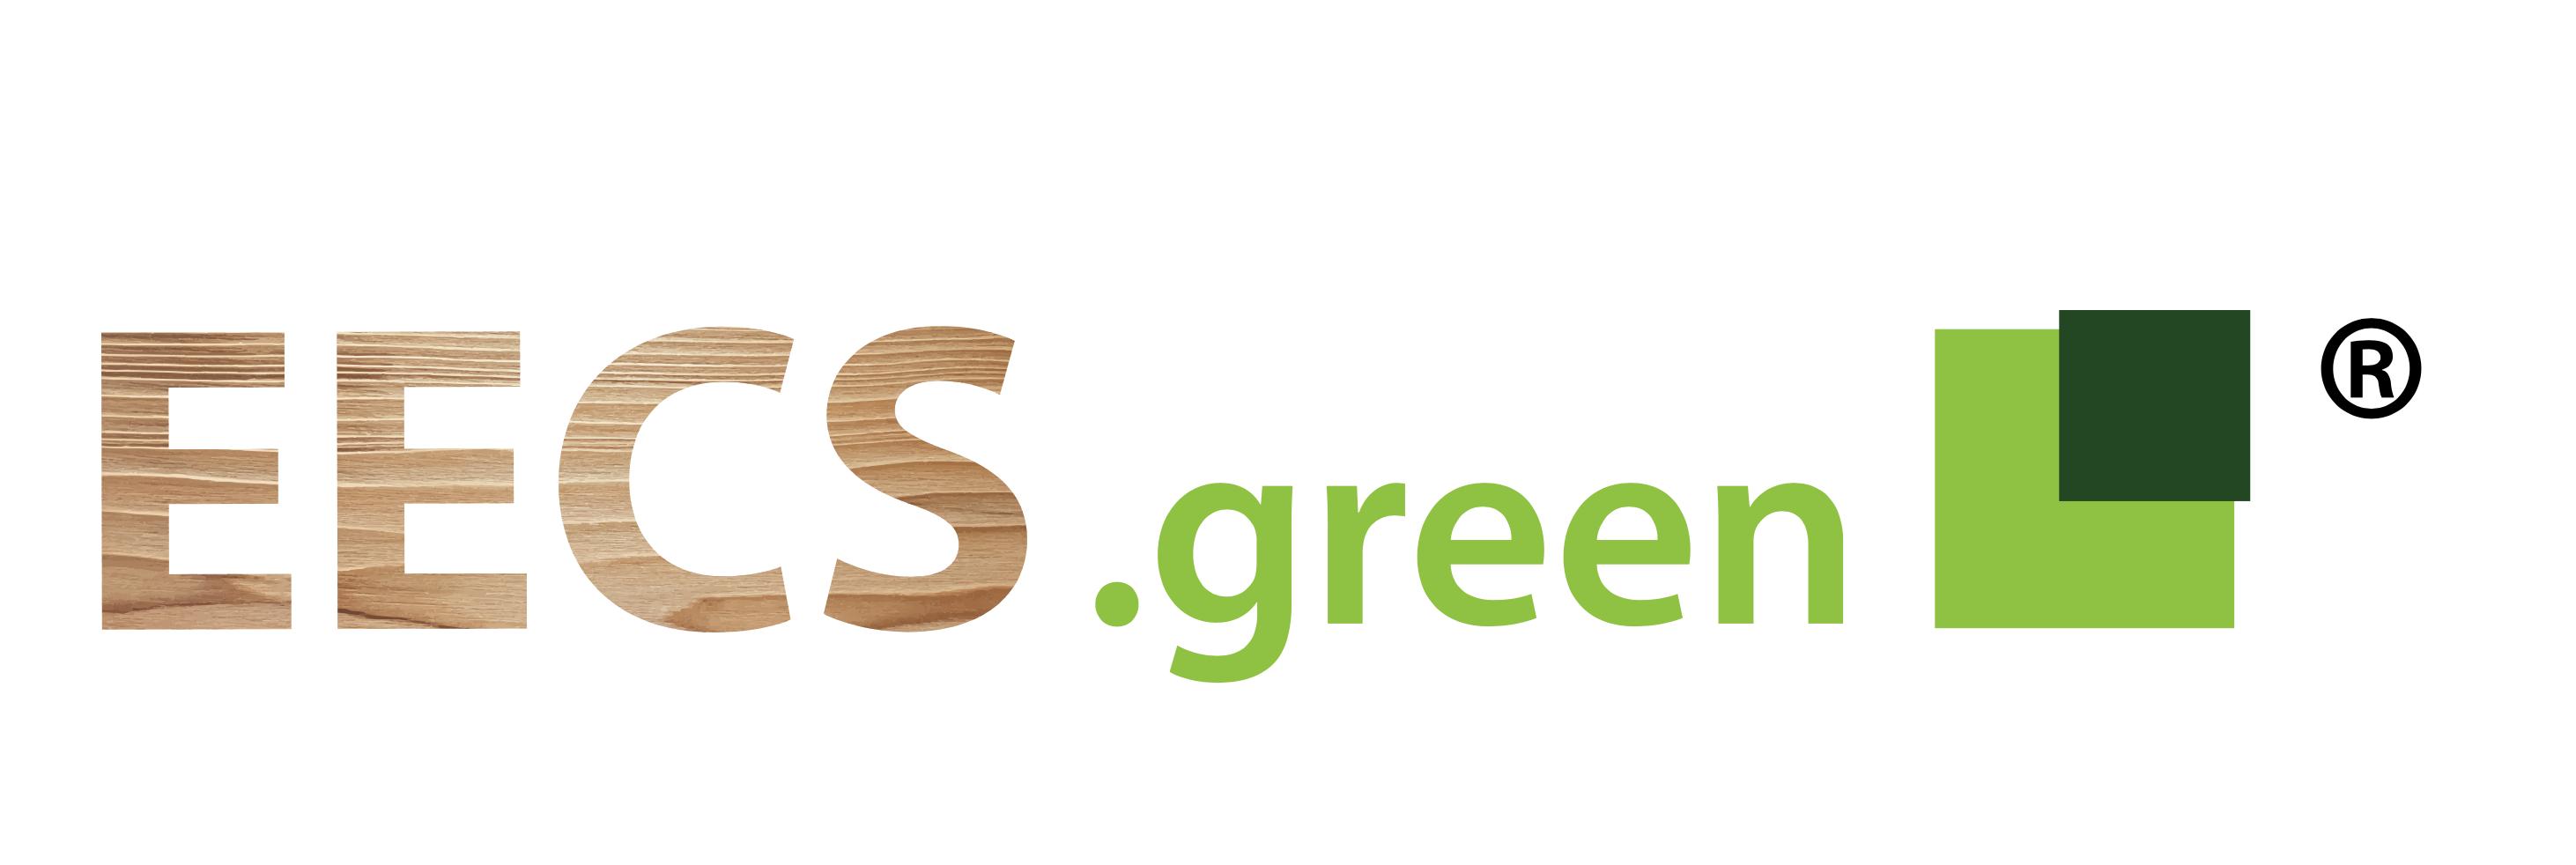 EECS_green_R_LOGO